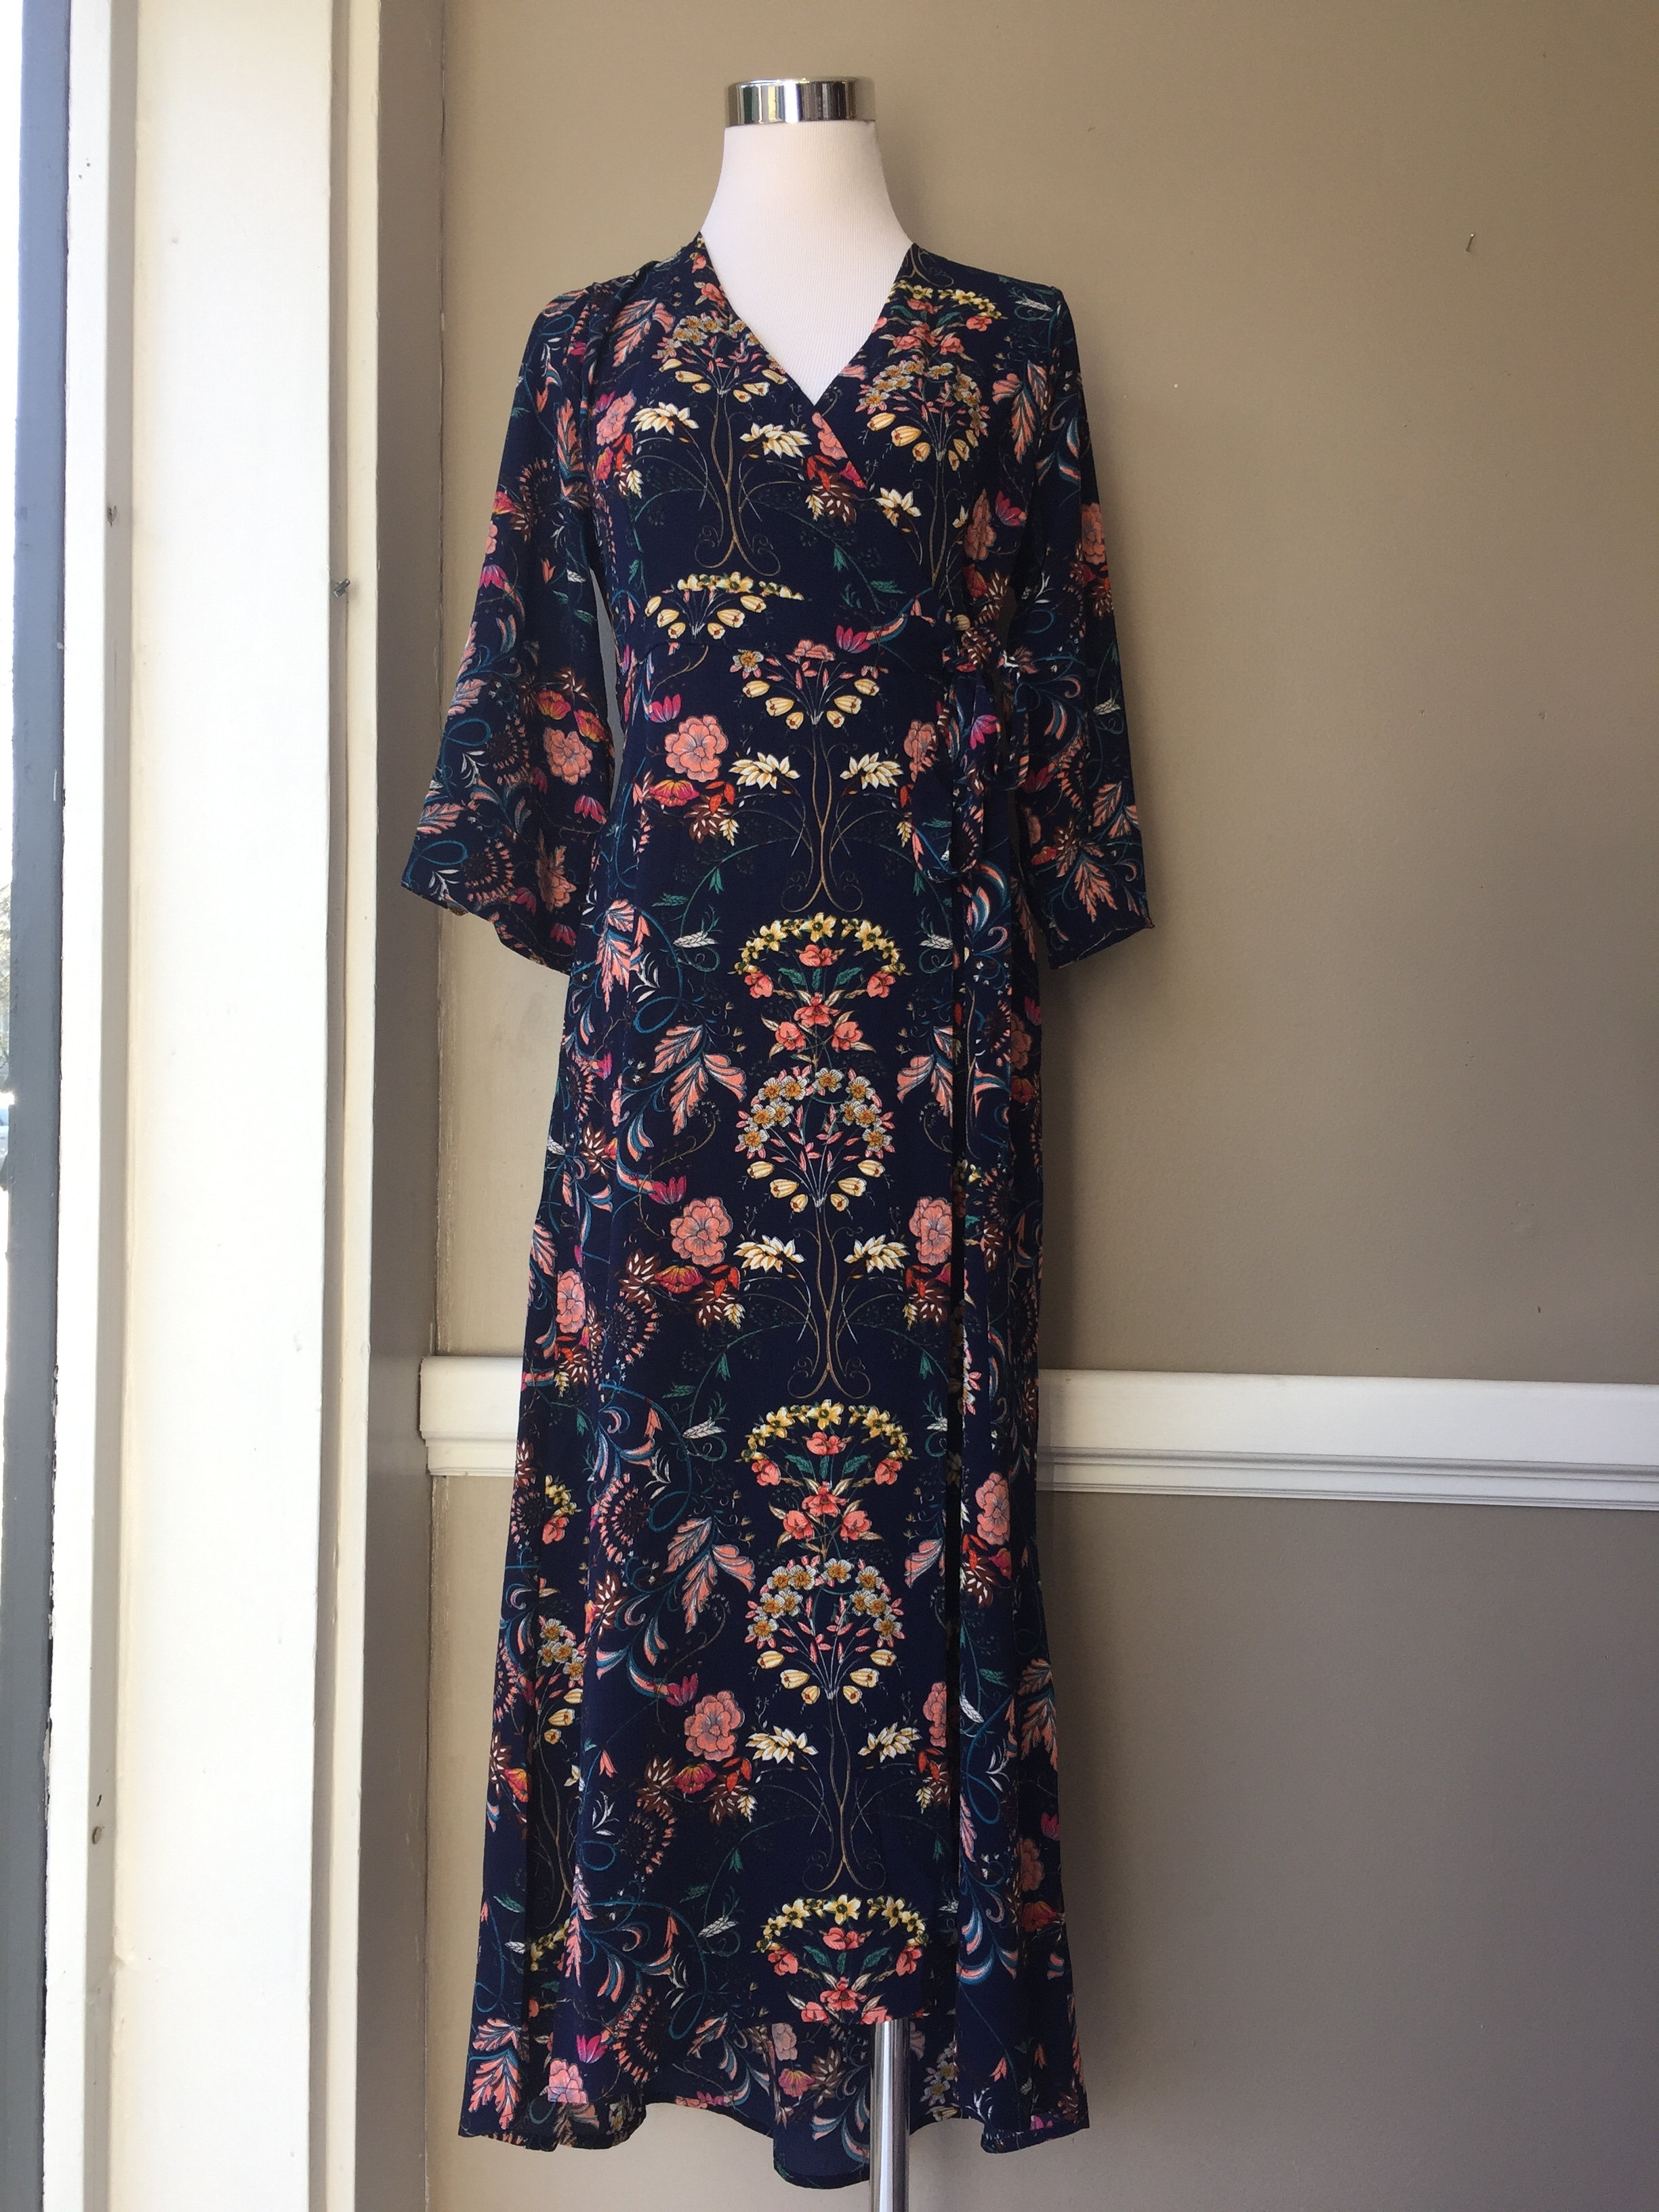 Navy Floral Maxi Dress $45